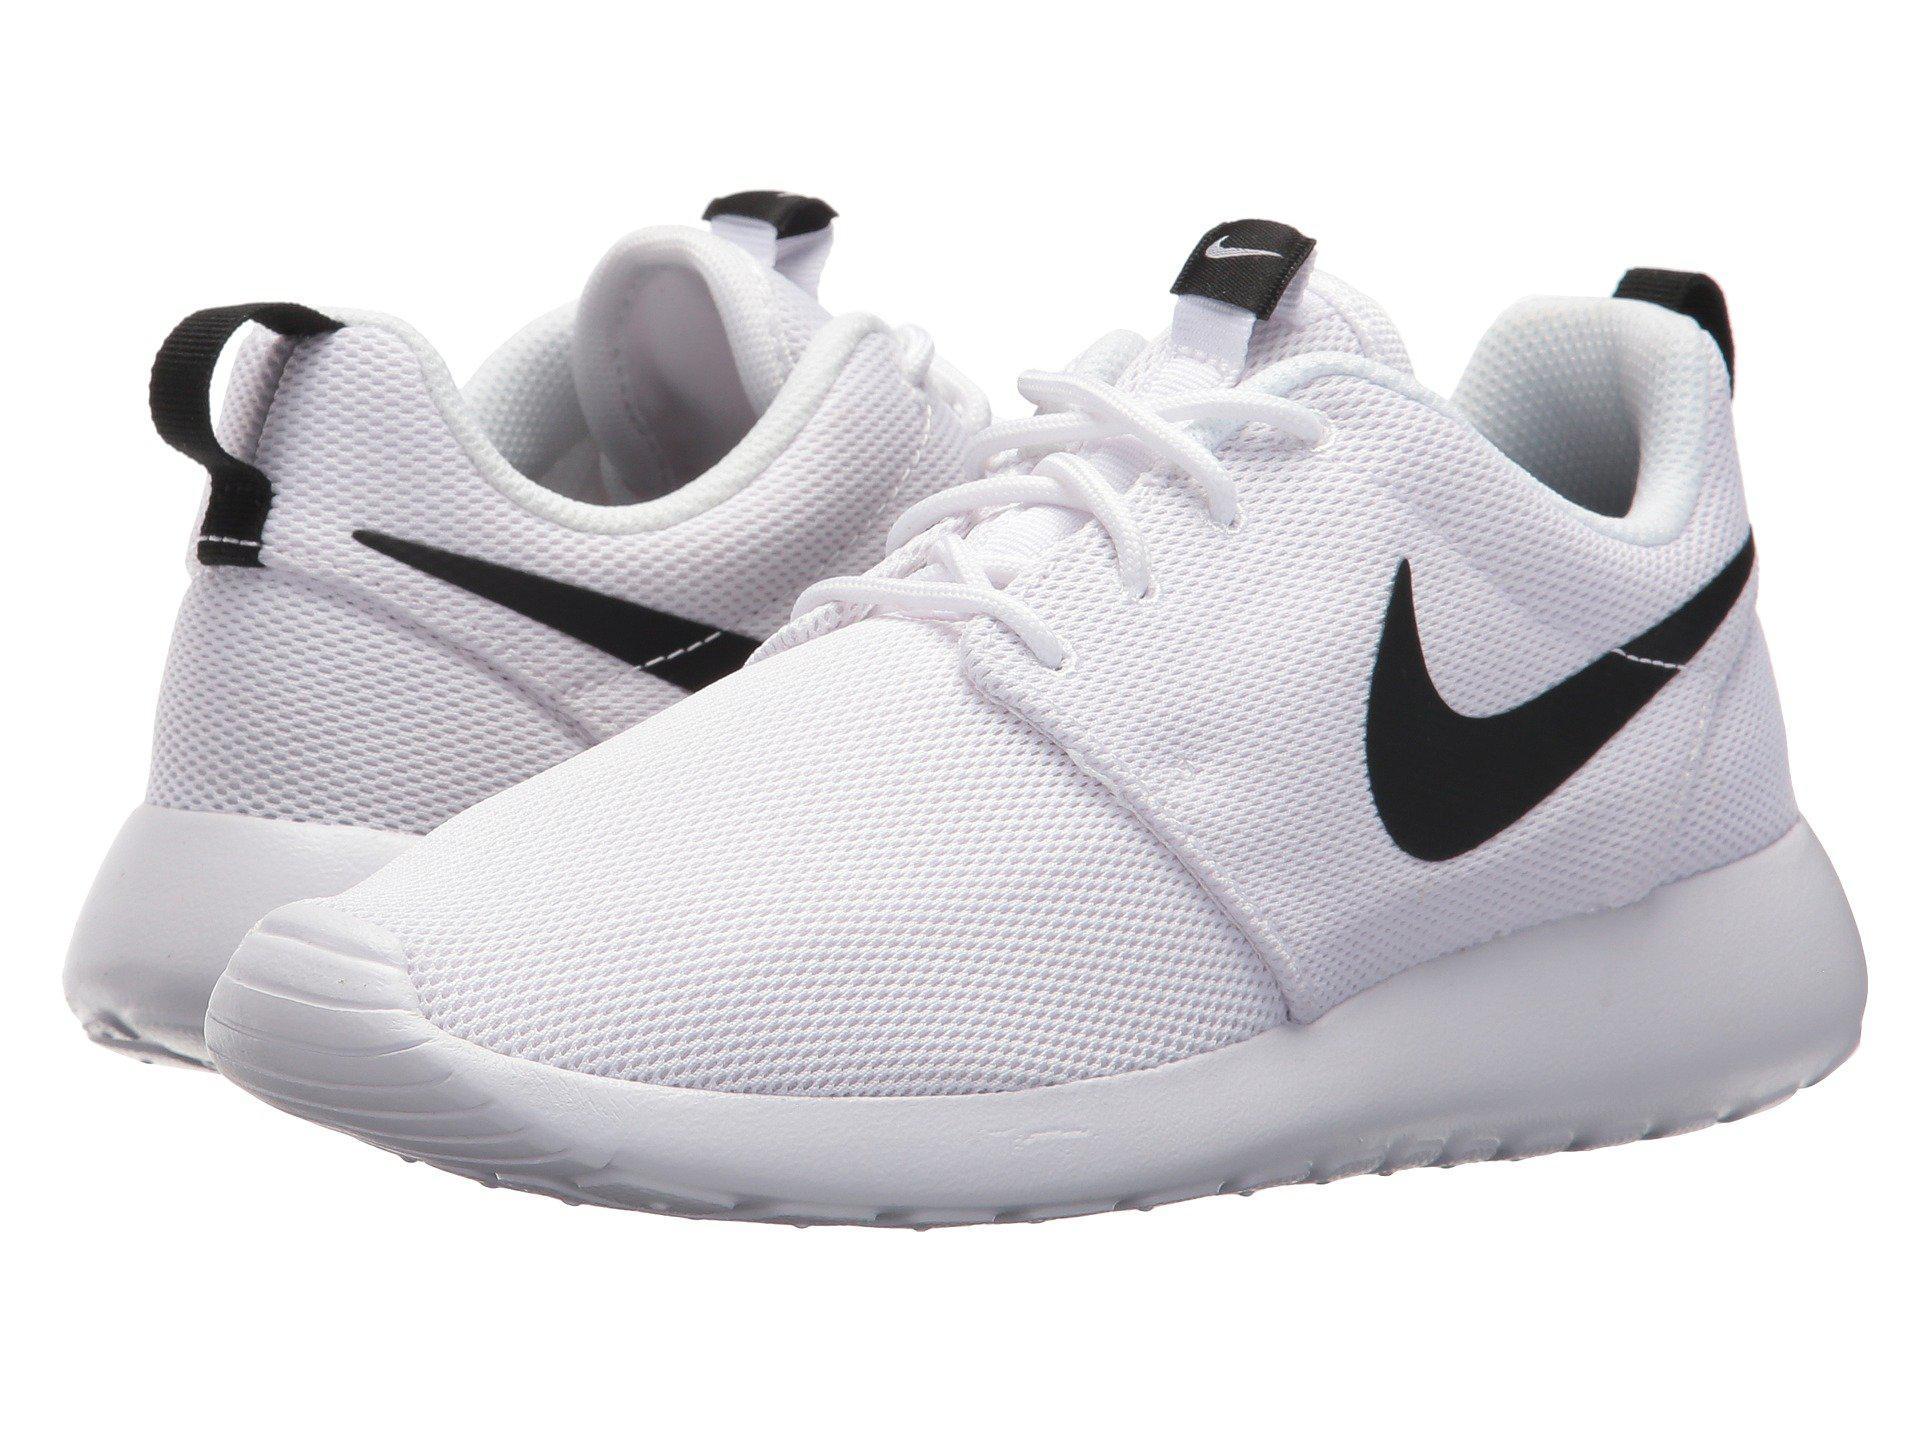 767cd94b8f800 Lyst - Nike Roshe One Shoe in White - Save 8%